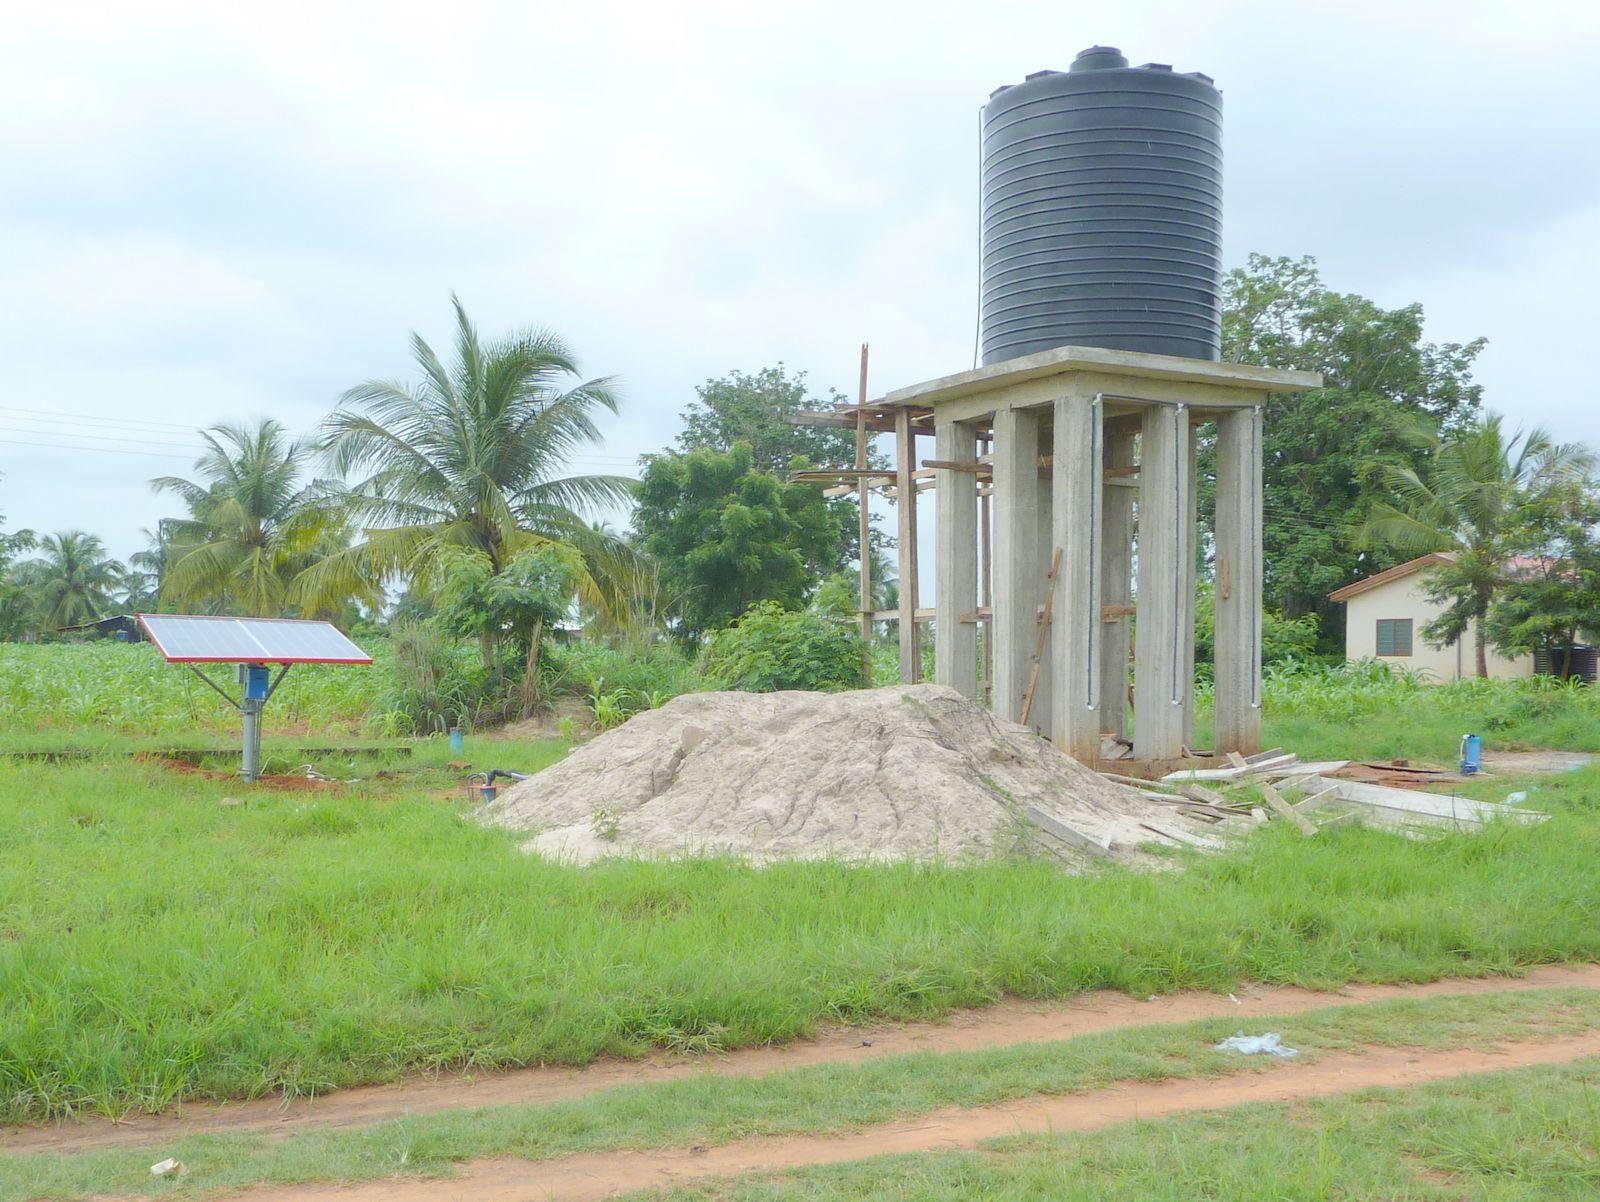 Aflao | Ghana<br/>